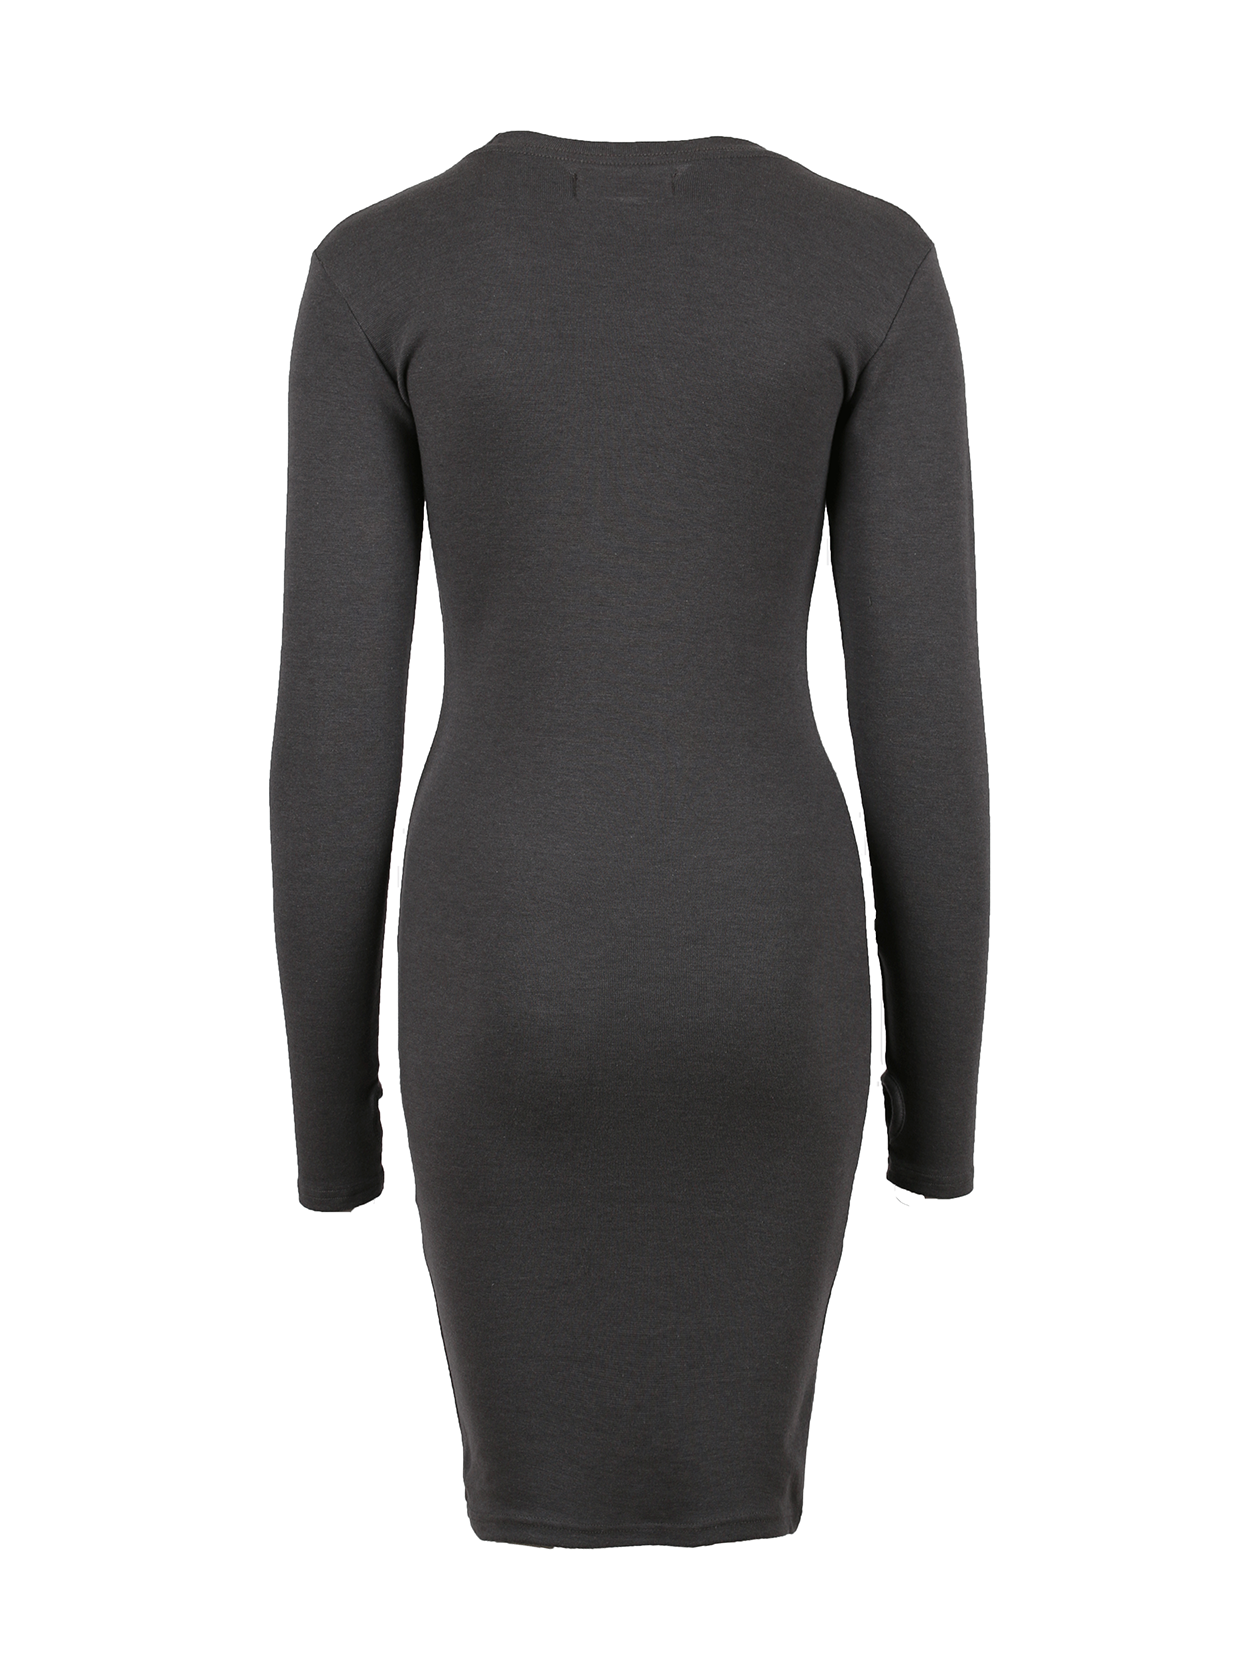 Платье женское SKINNY RIB от Black Star